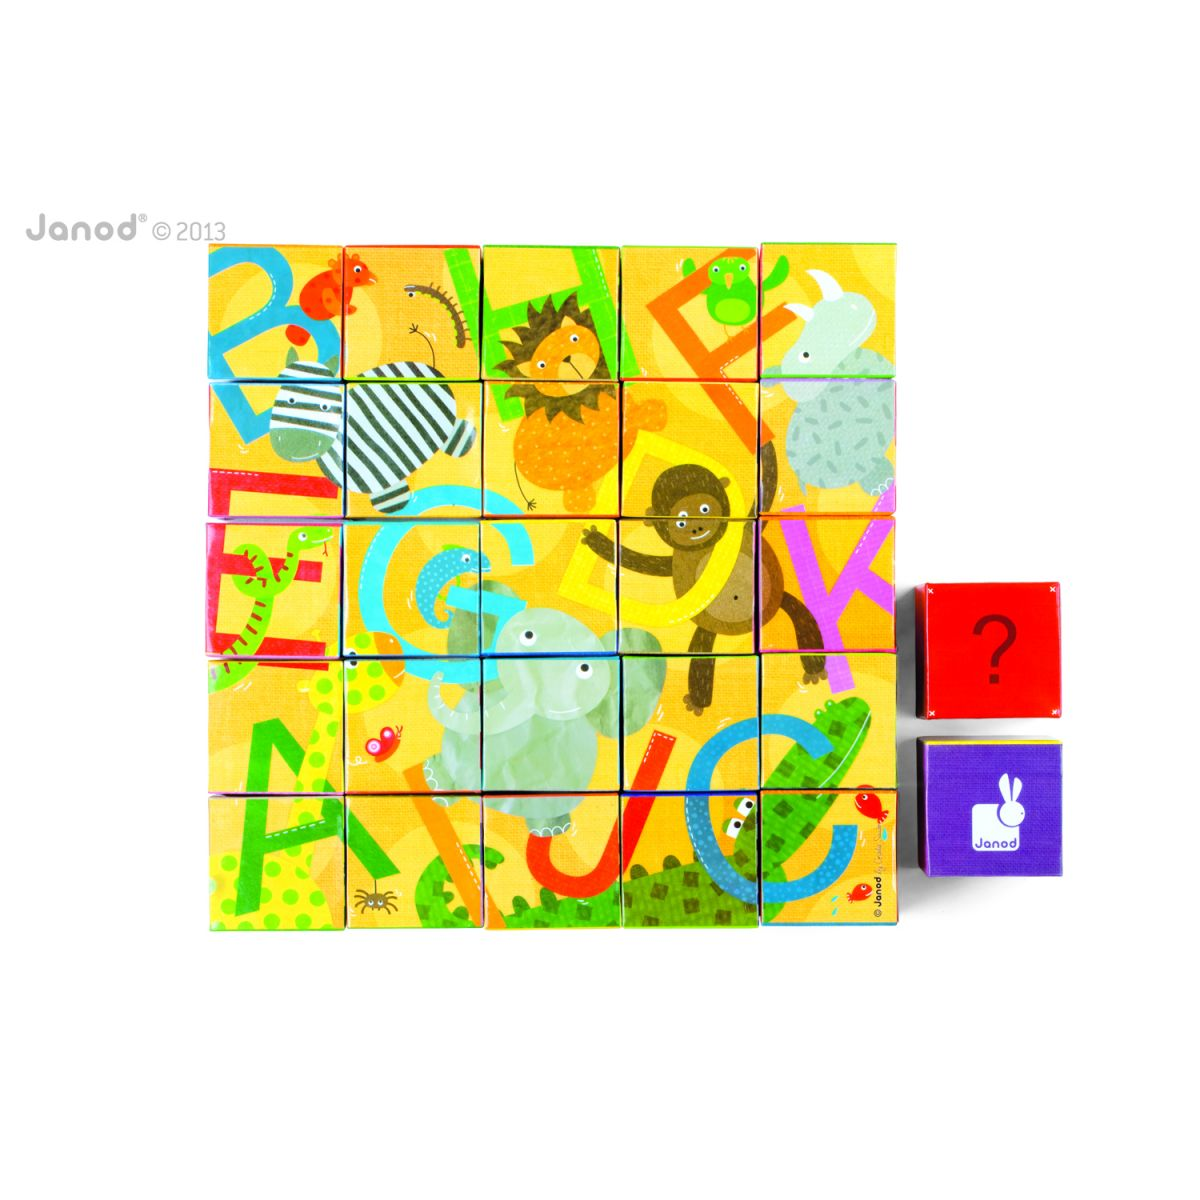 Cubes kubkid alphabet partir de 2 ans sebio for Rehausseur a partir de 2 ans